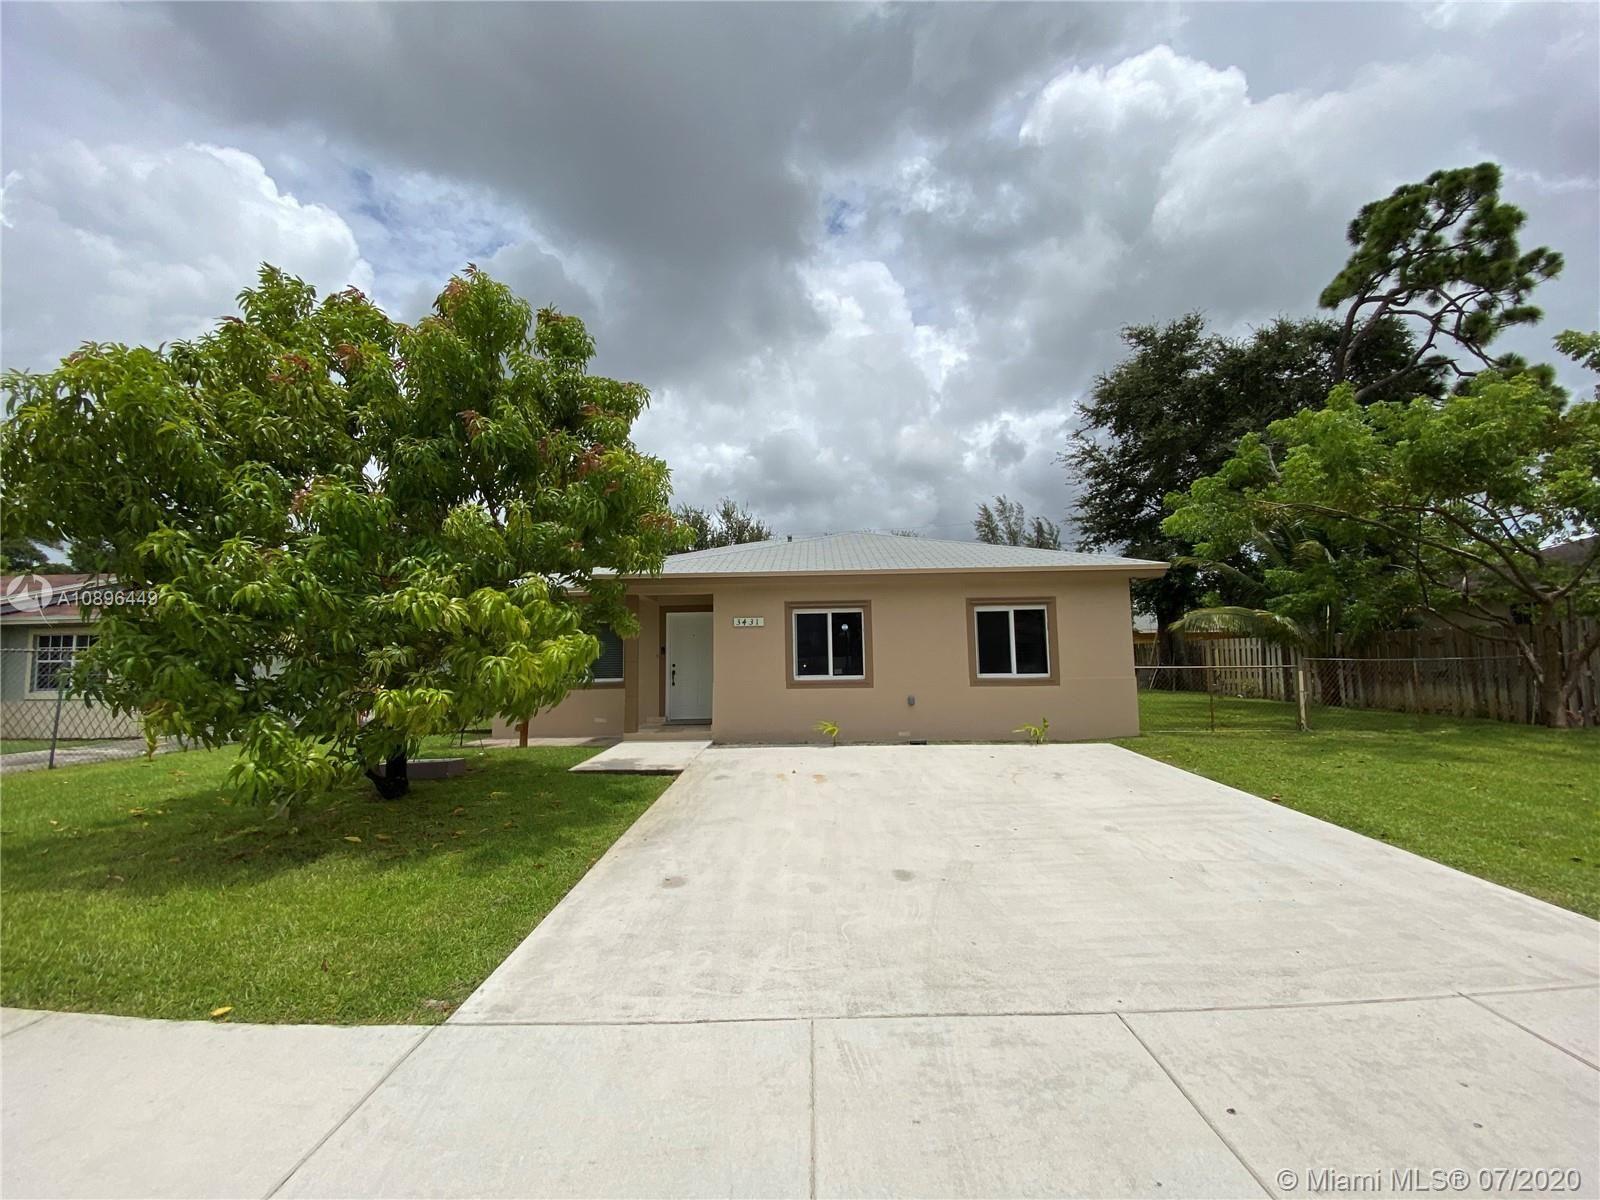 3431 NW 211th St, Miami Gardens, FL 33056 - #: A10896449